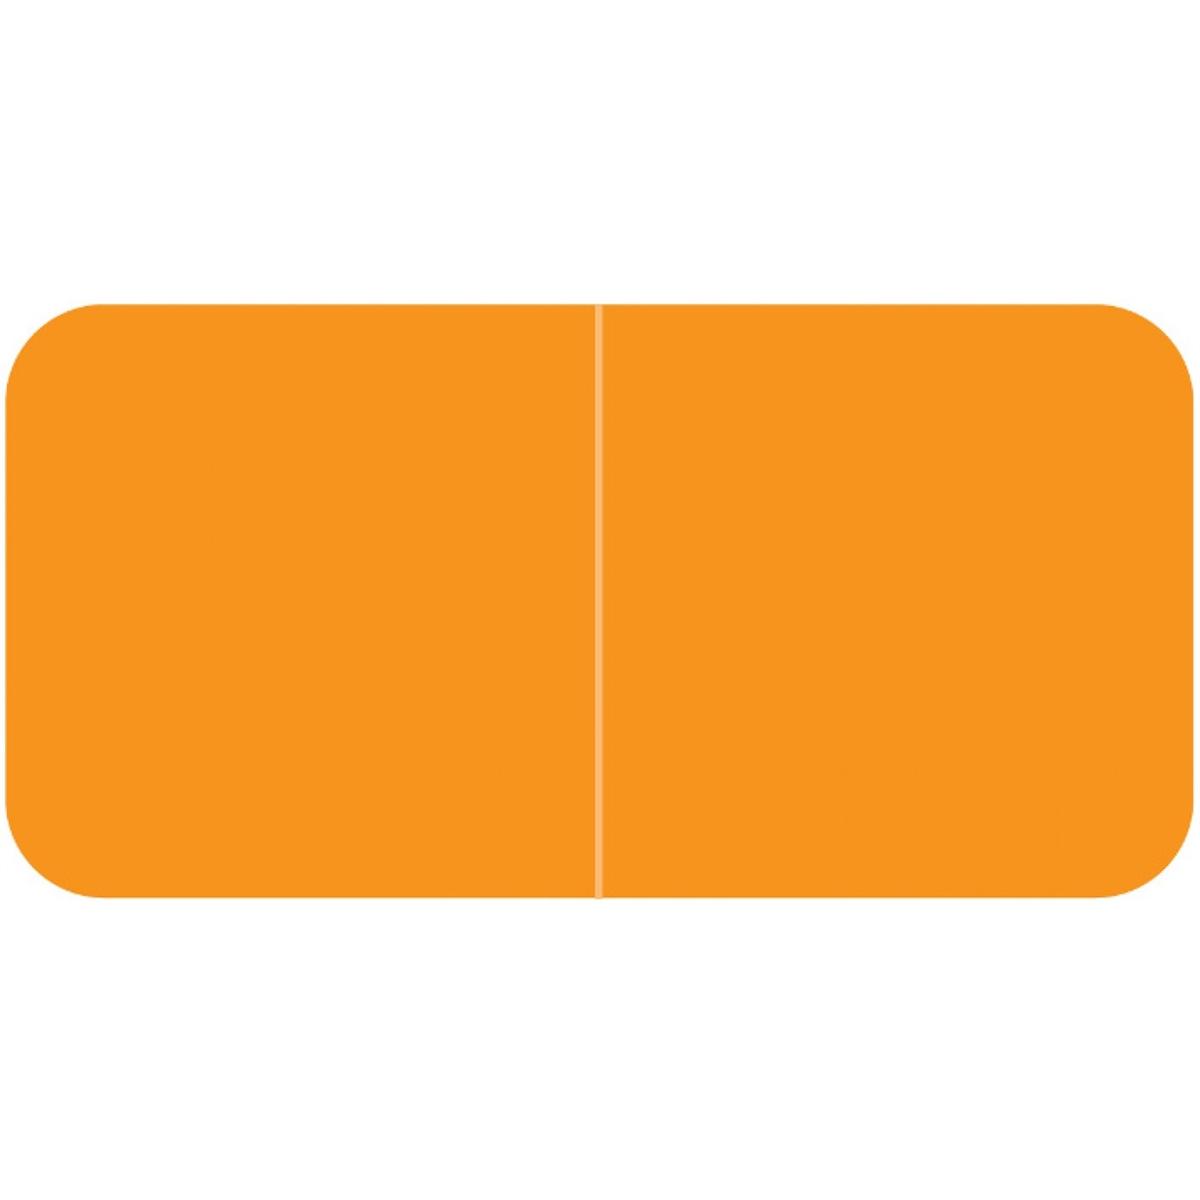 1//2H x 1-1//2W Black Roll of 500 Laminated Barkley Compatible Solid Designation Label